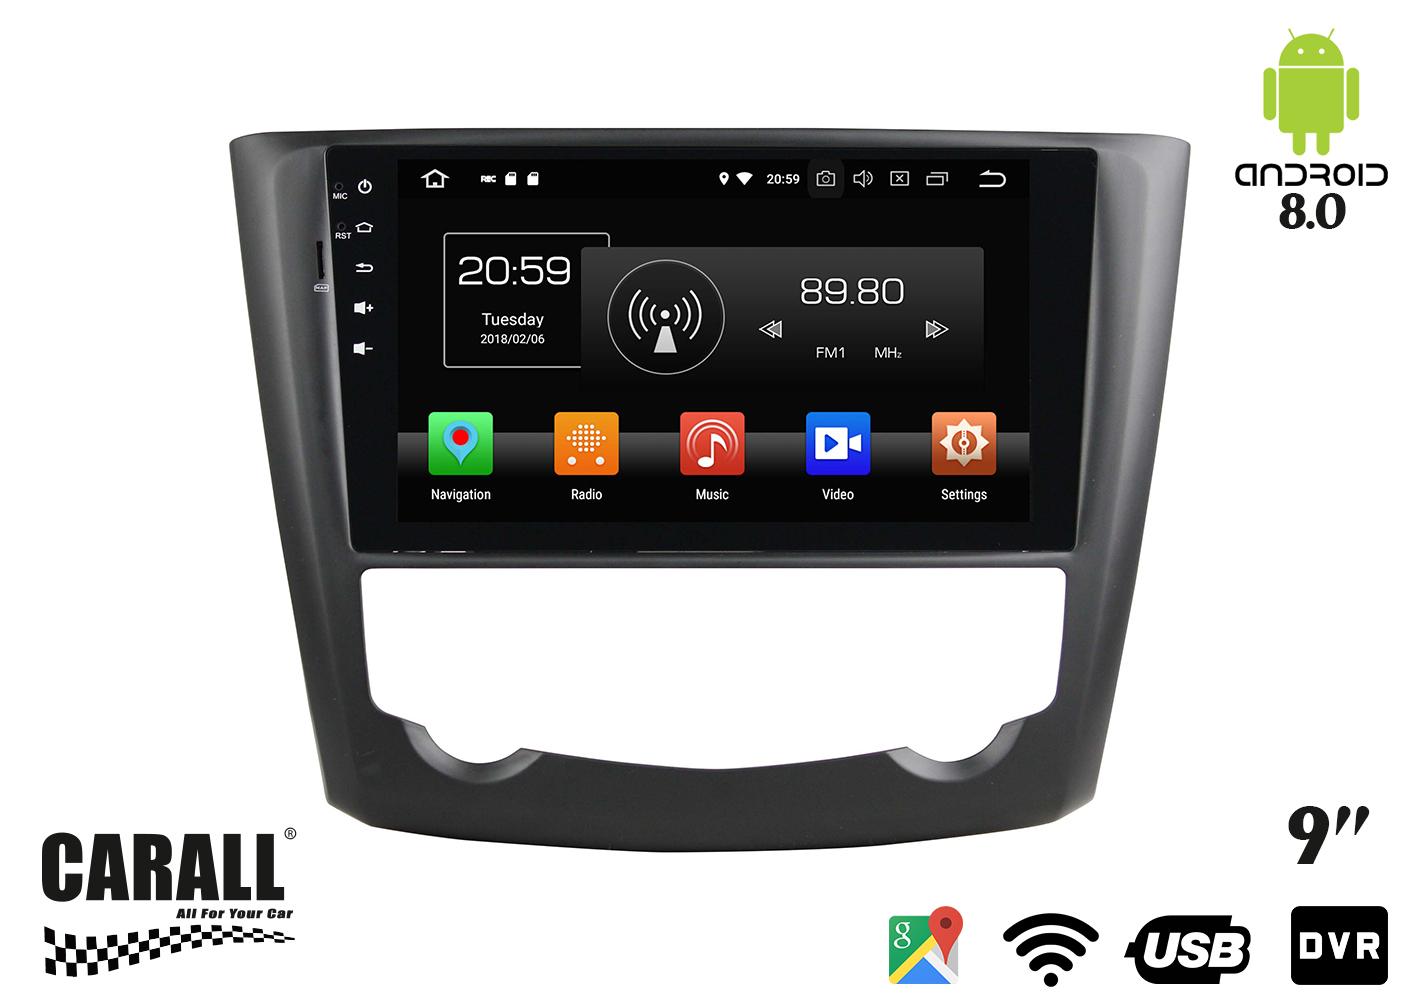 Autoradio Android 8,0 Renault Kadjar GPS DVD USB SD WI-FI Bluetooth Navigatore - KIT